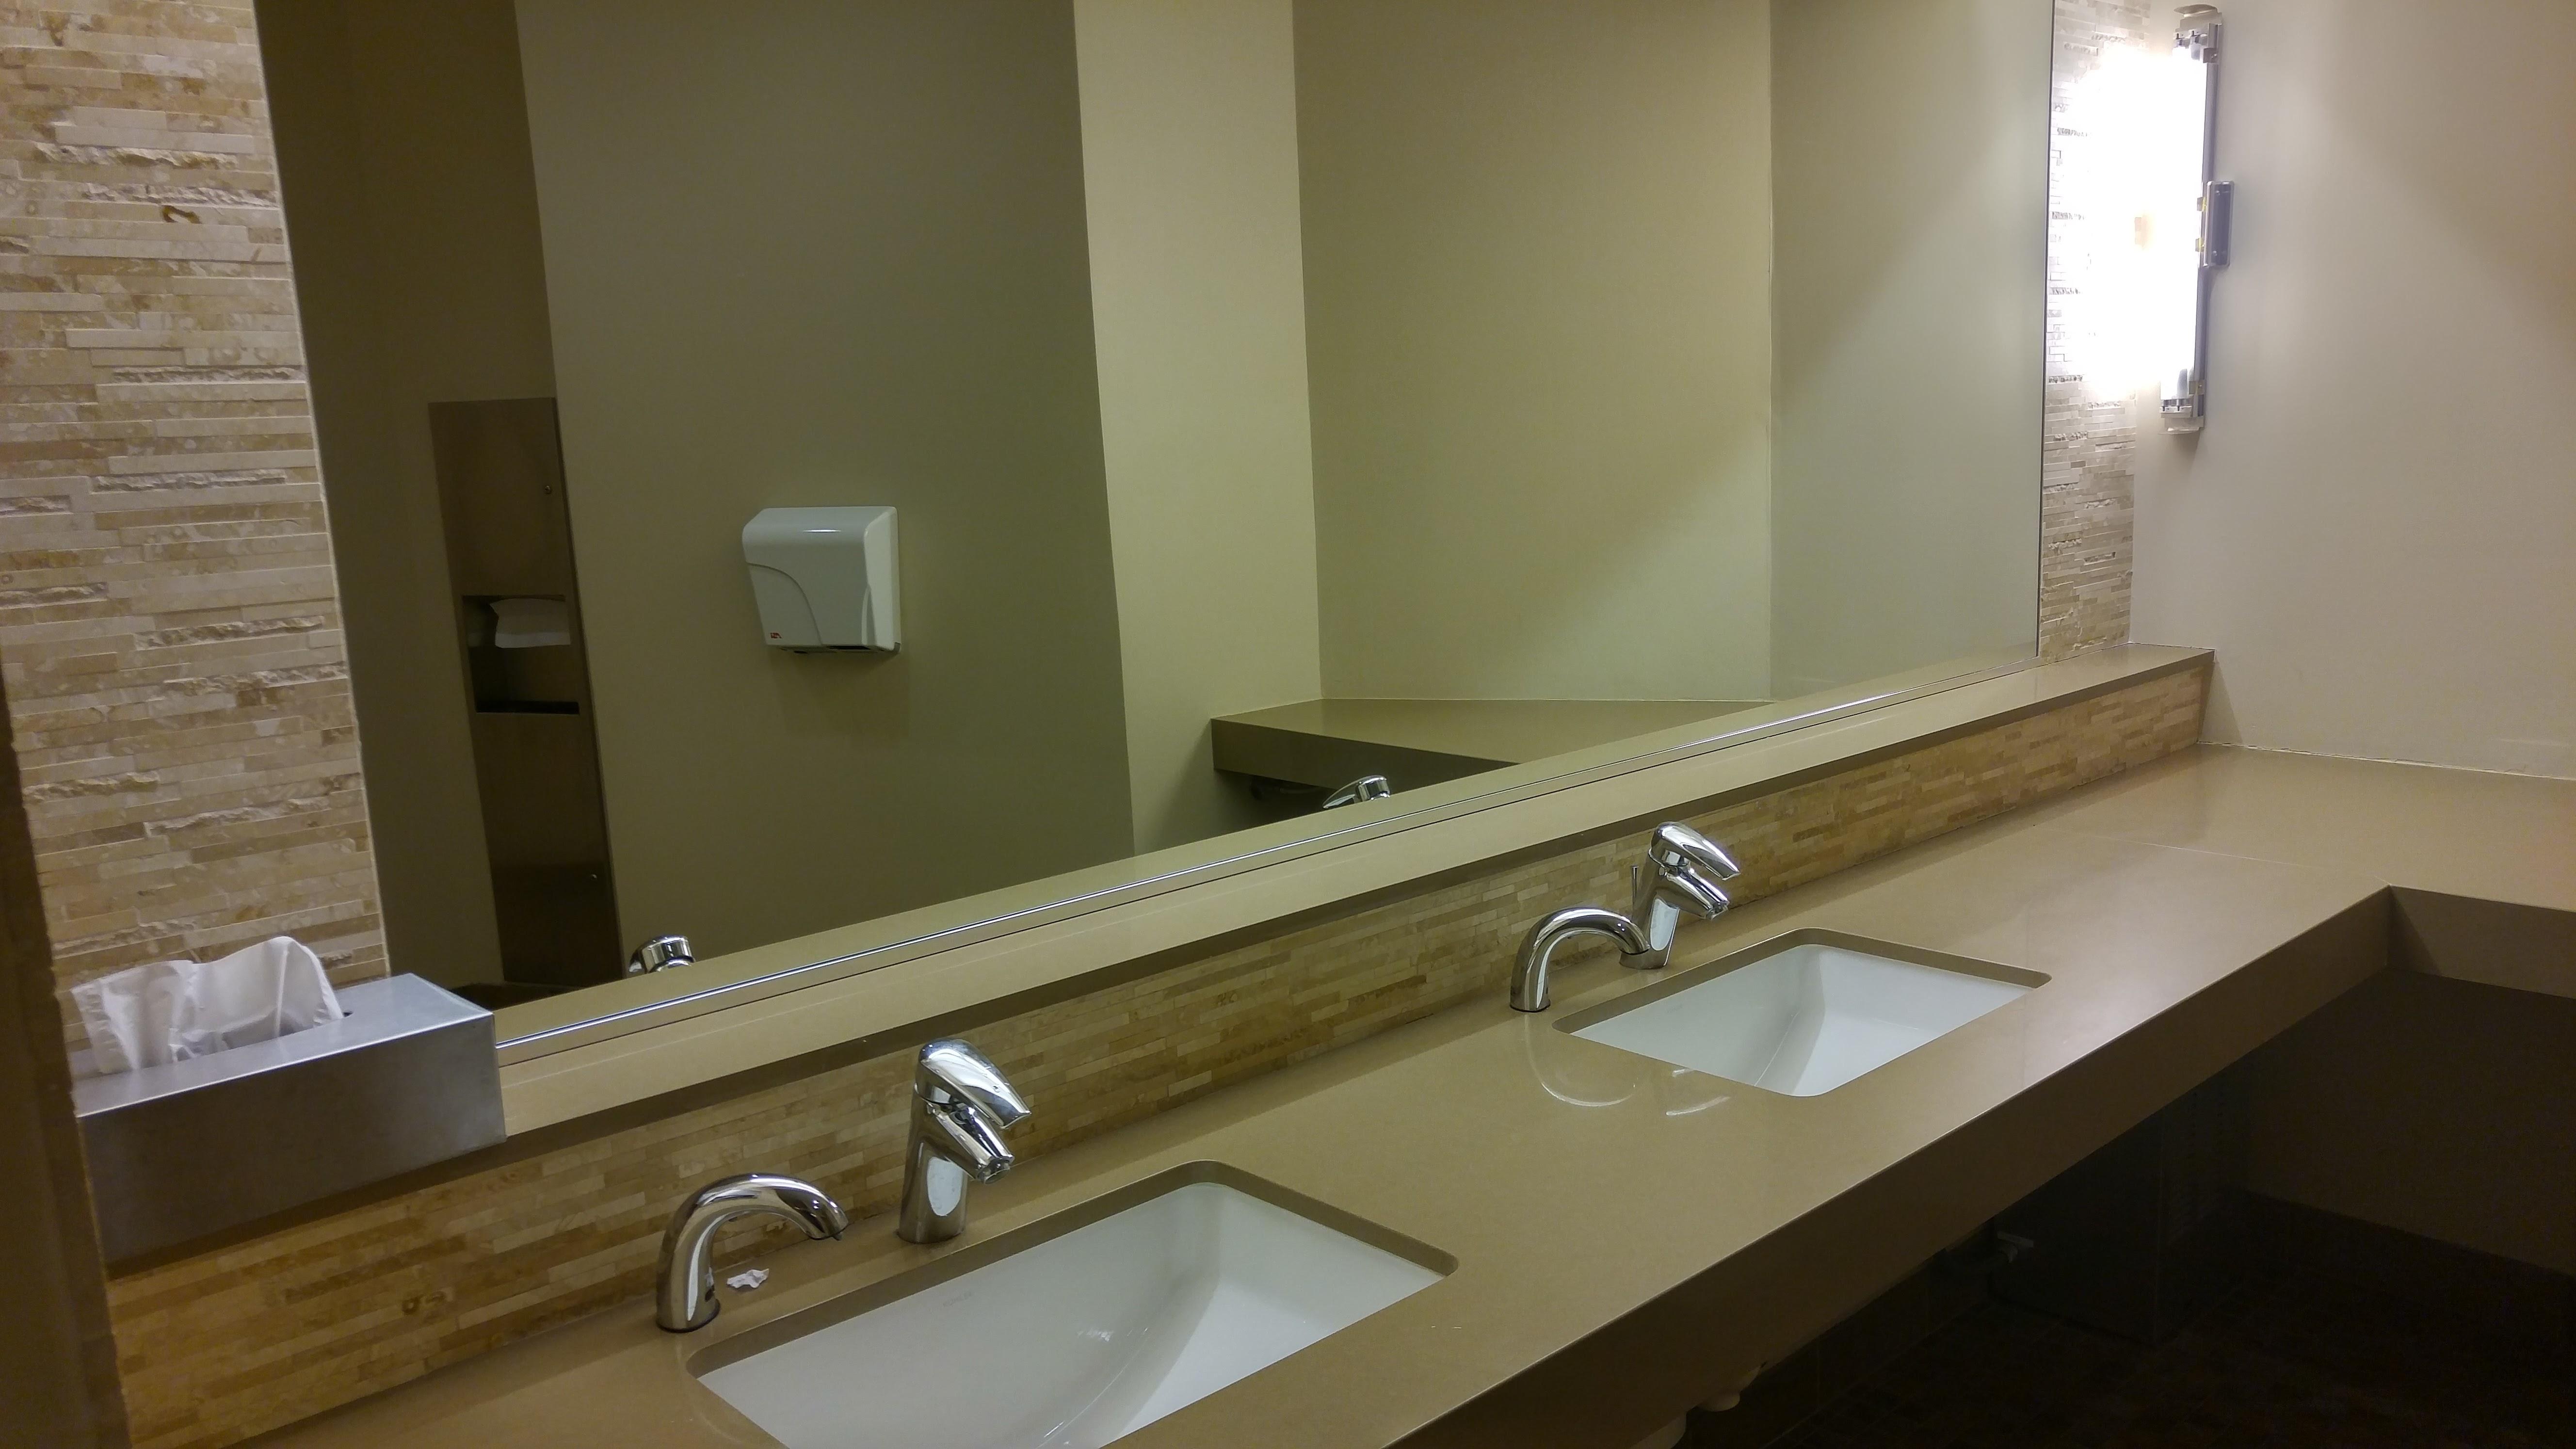 Bathroom Fixtures Redwood City jacob jewish center, redwood city, california - bathroom review